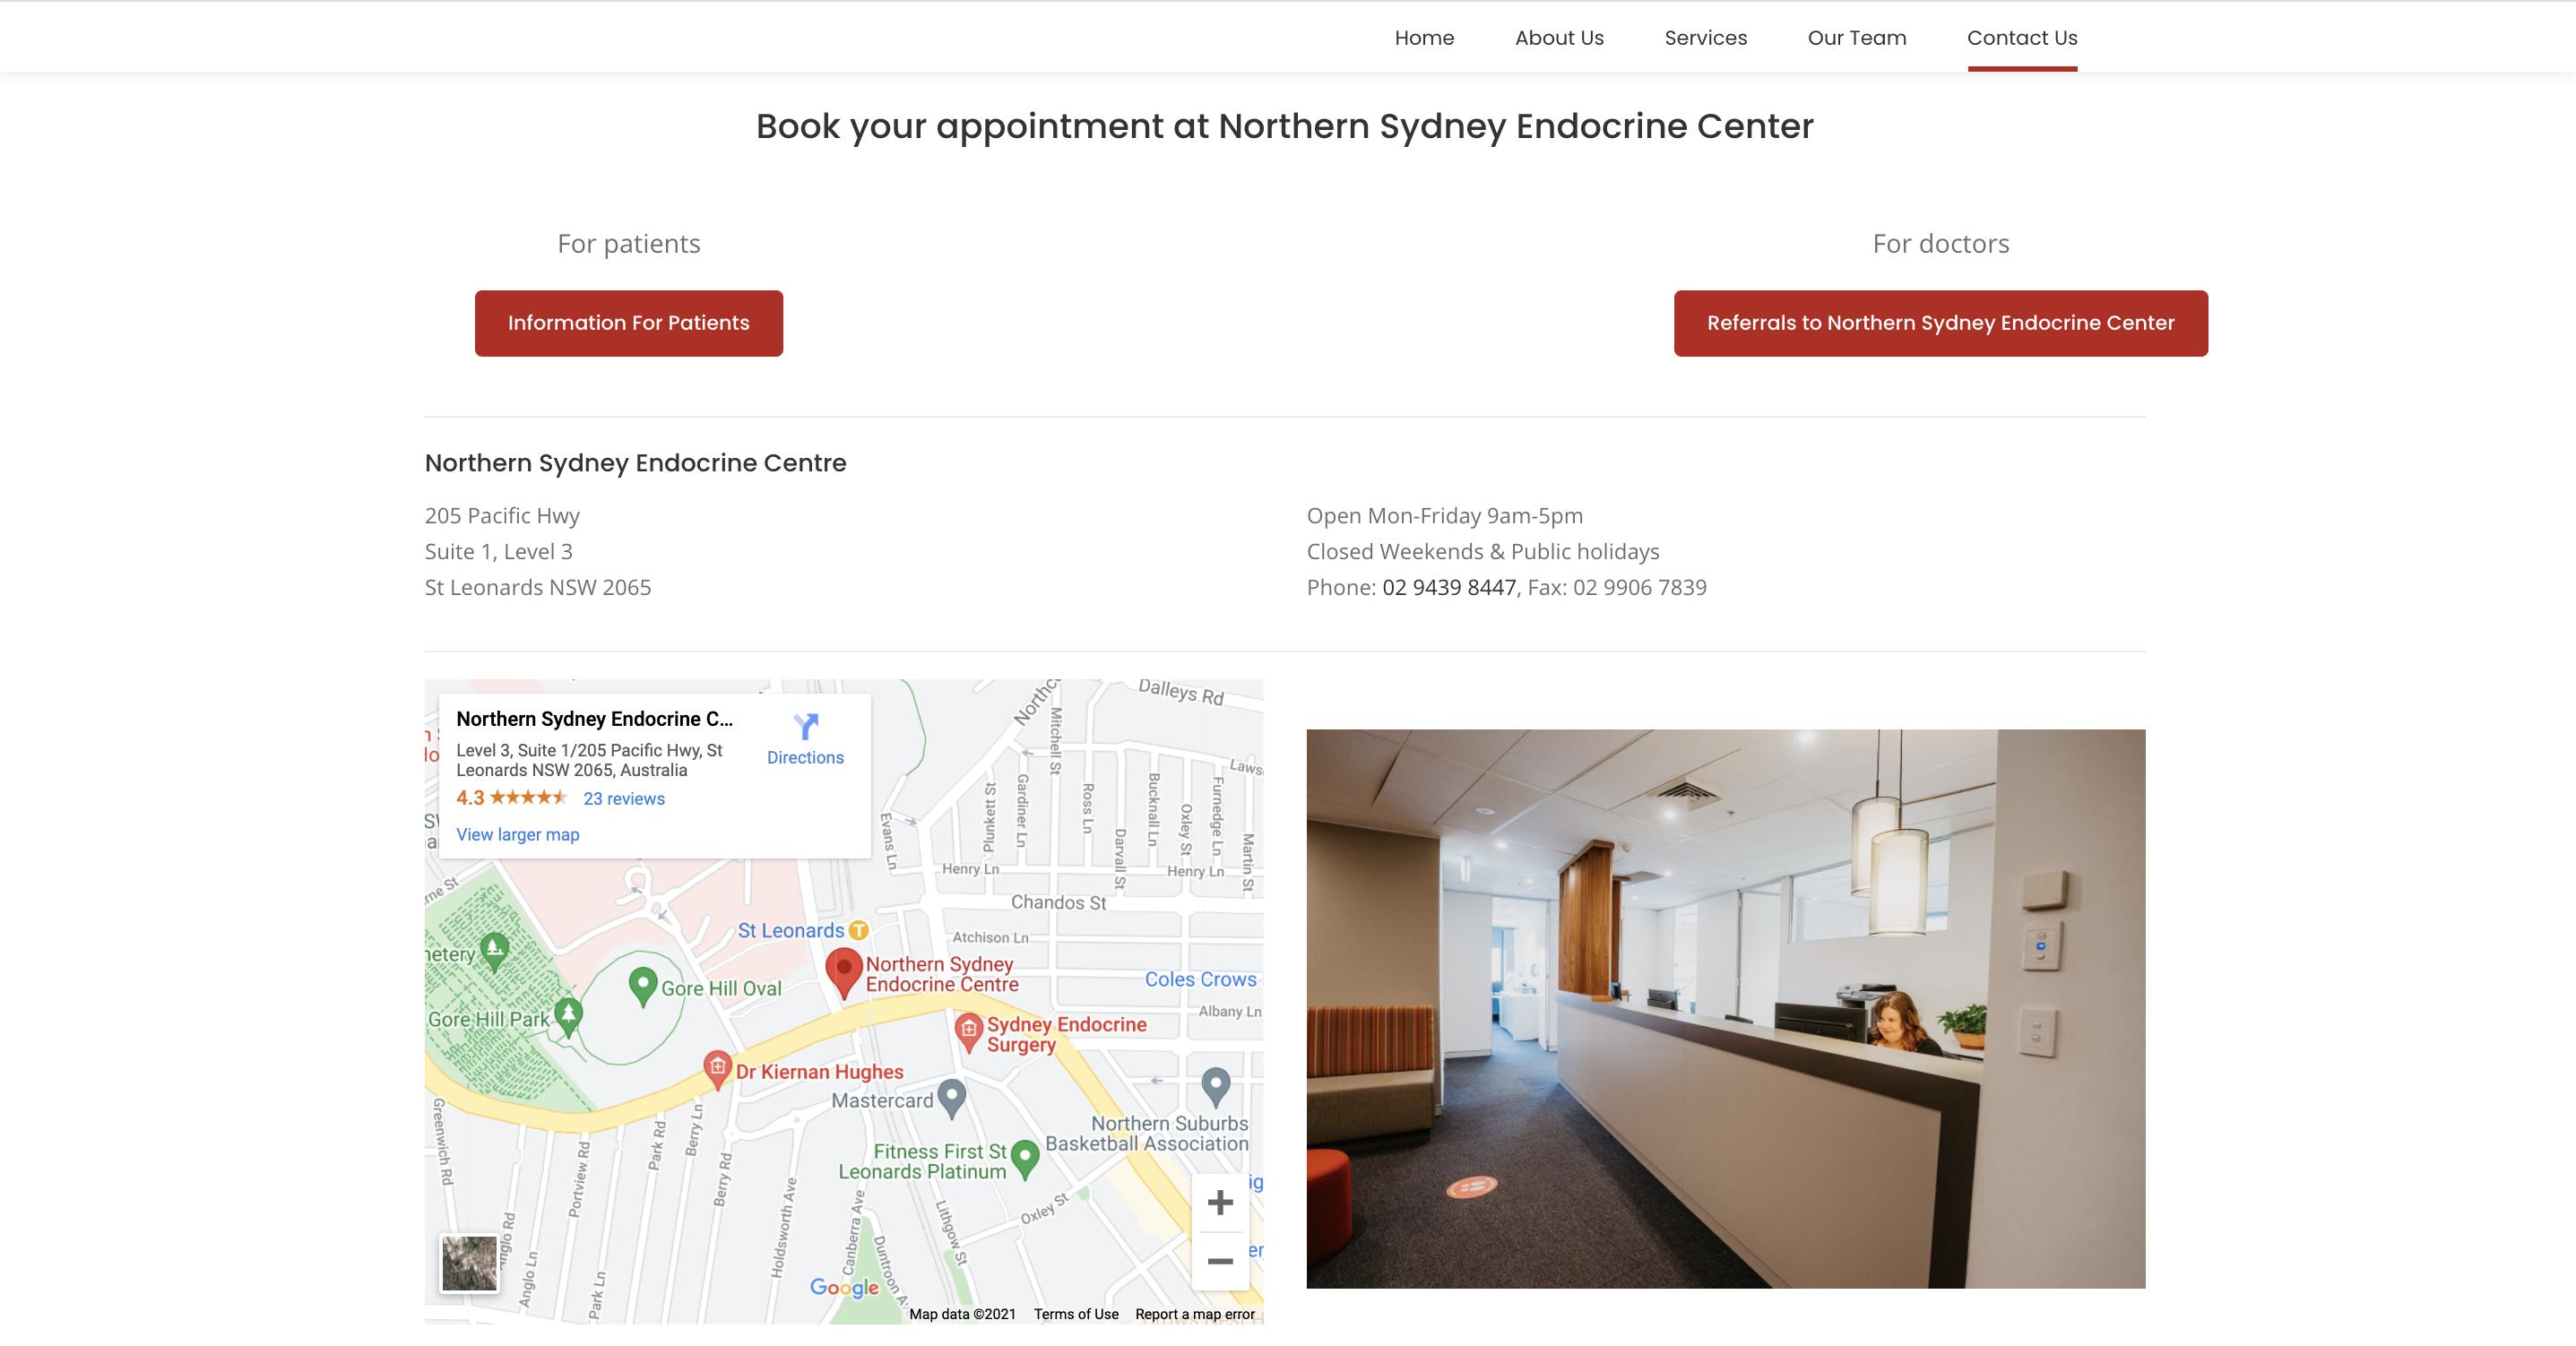 Northern Sydney Endocrine Centre